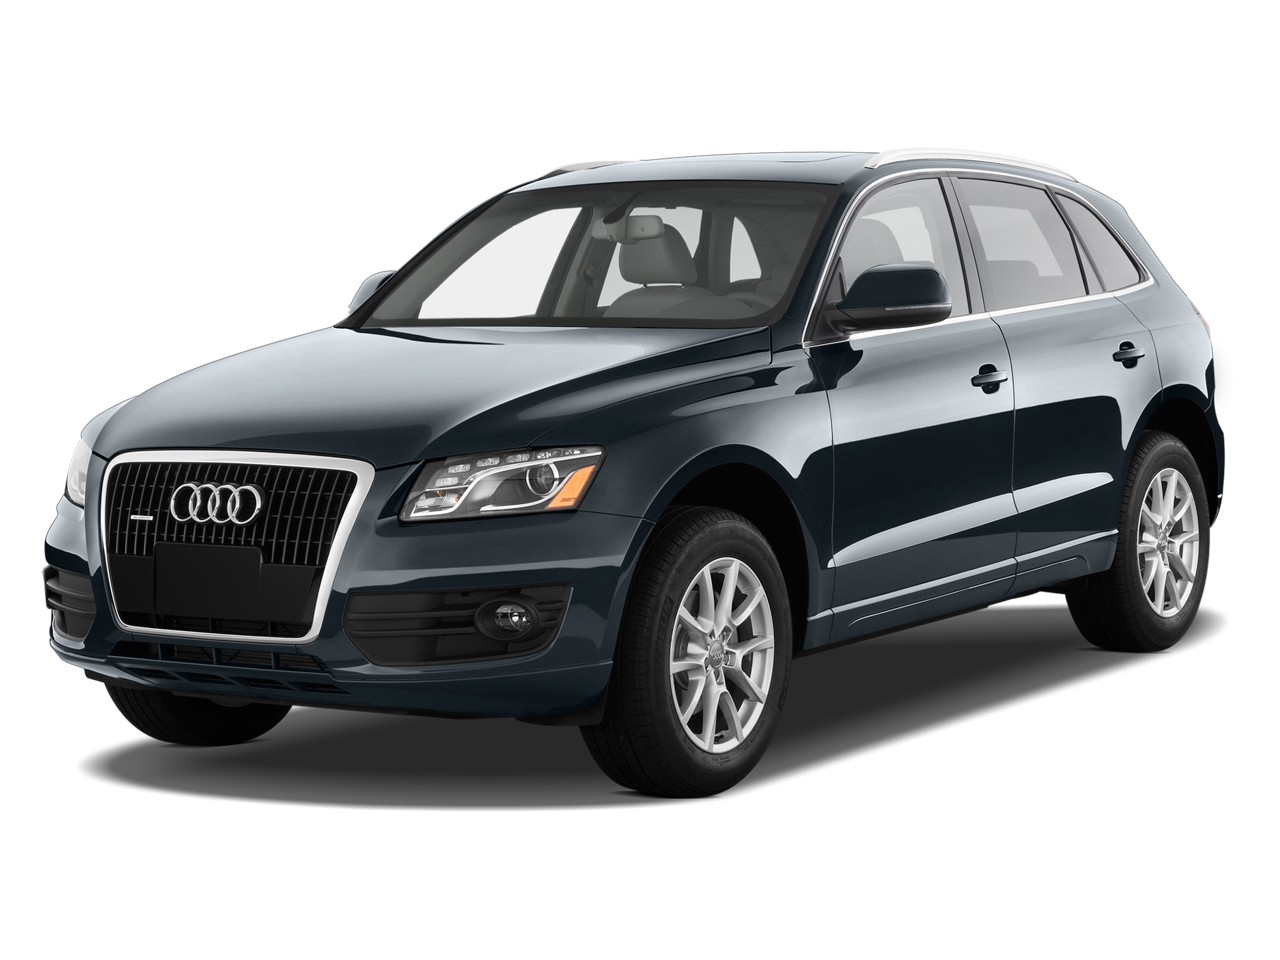 Kekurangan Audi 2012 Spesifikasi